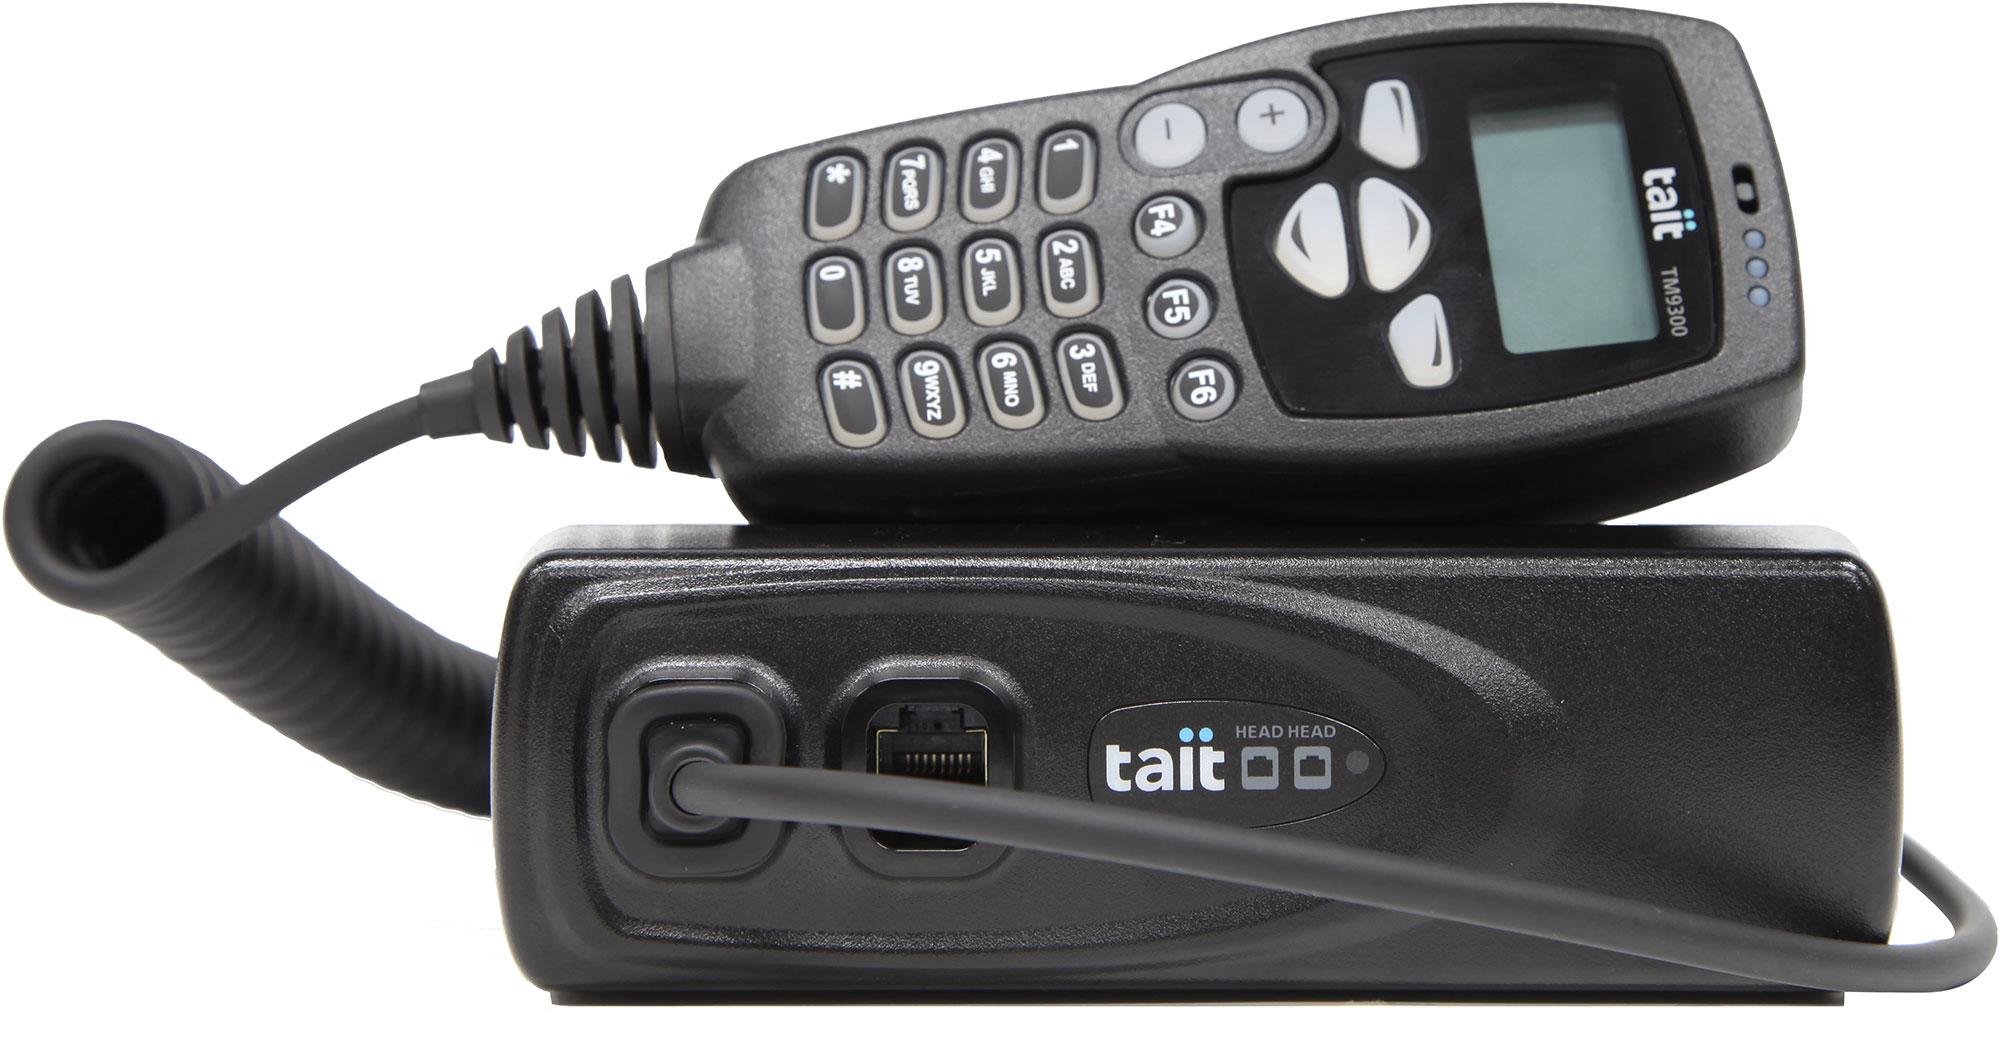 TAIT TM9355HHC Mobile Handheld Controller DMR VHF/ UHF 25Watts